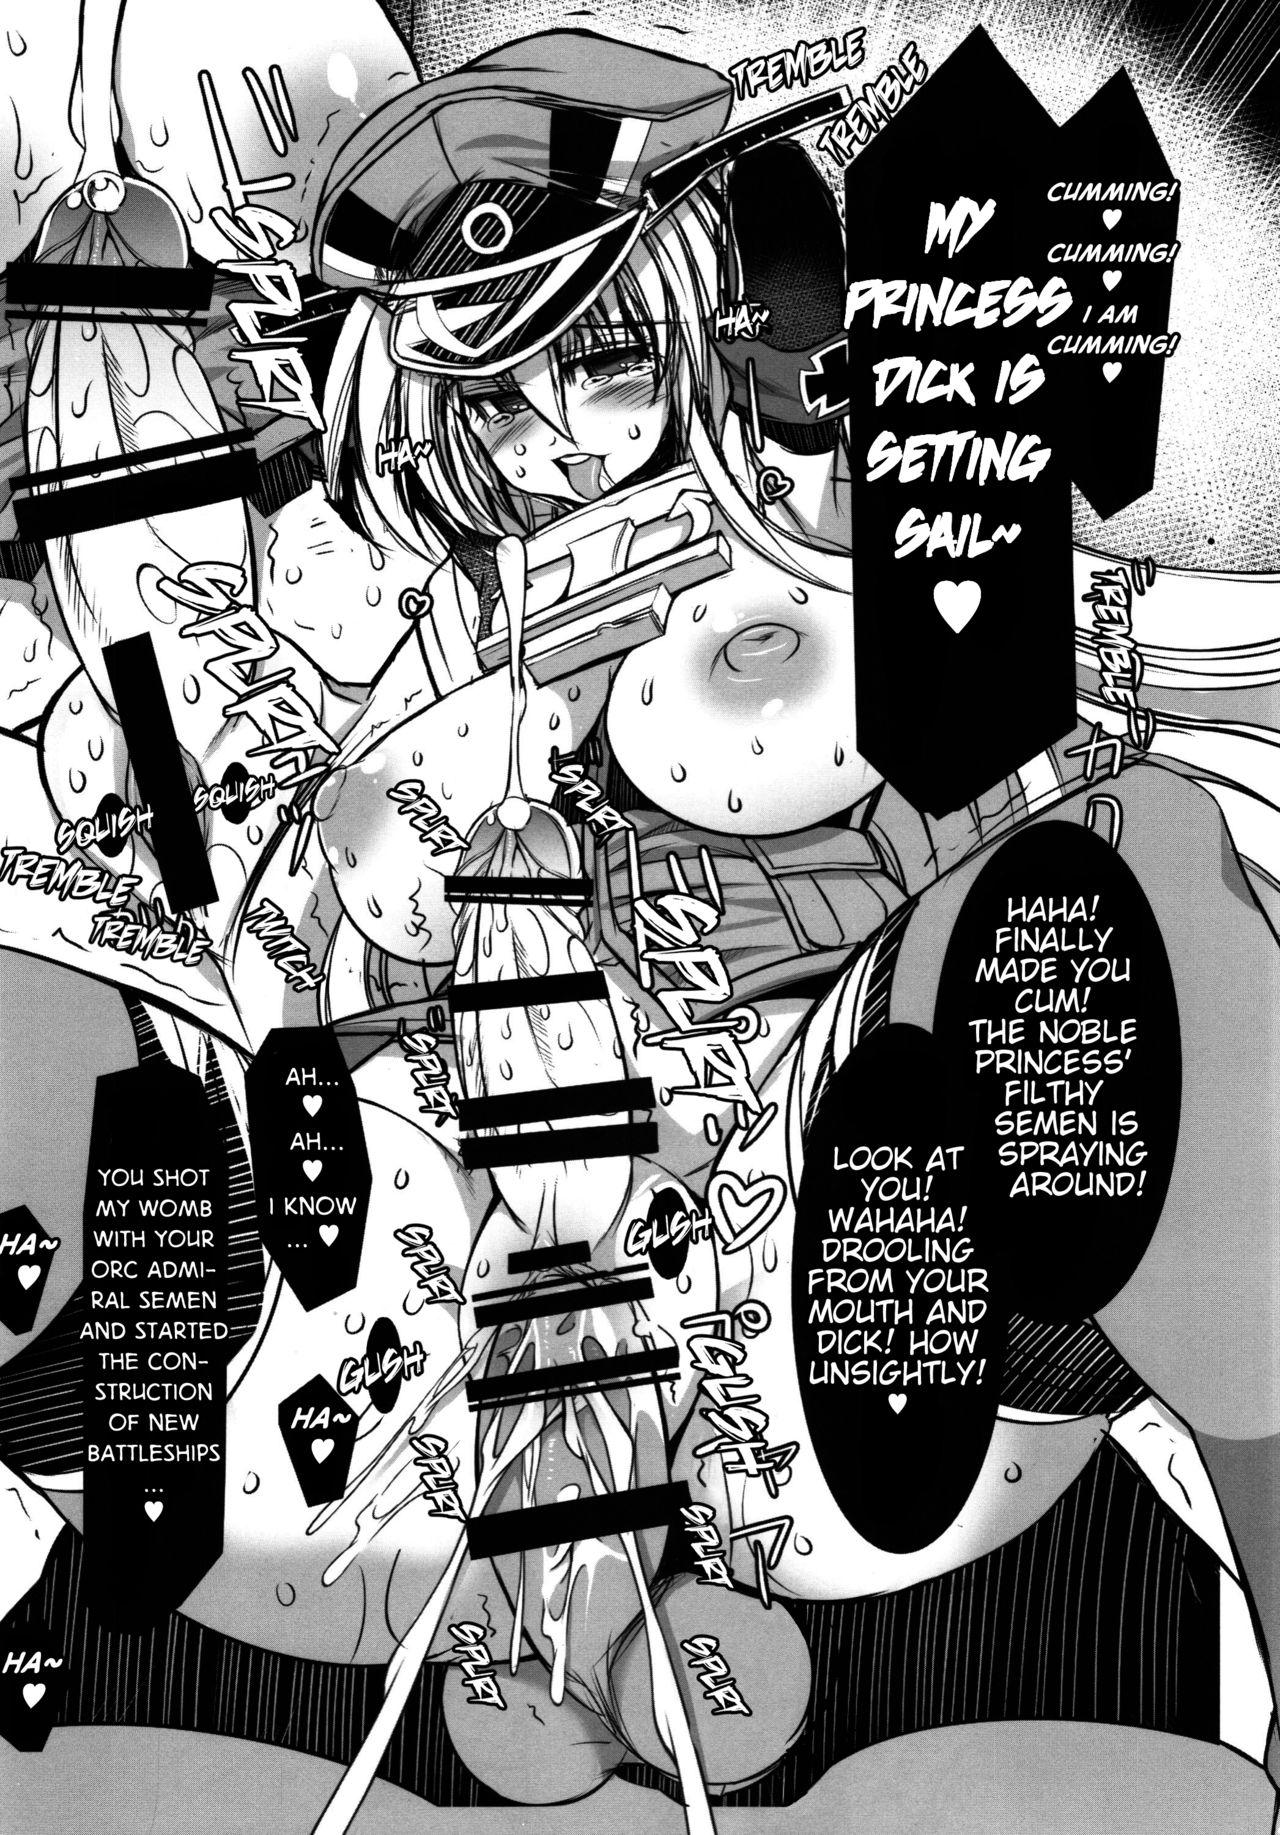 Himekishi Senkan Bismarck Toraware no Himesenkan | The Captured Princess Knight Battleship Bismarck 14